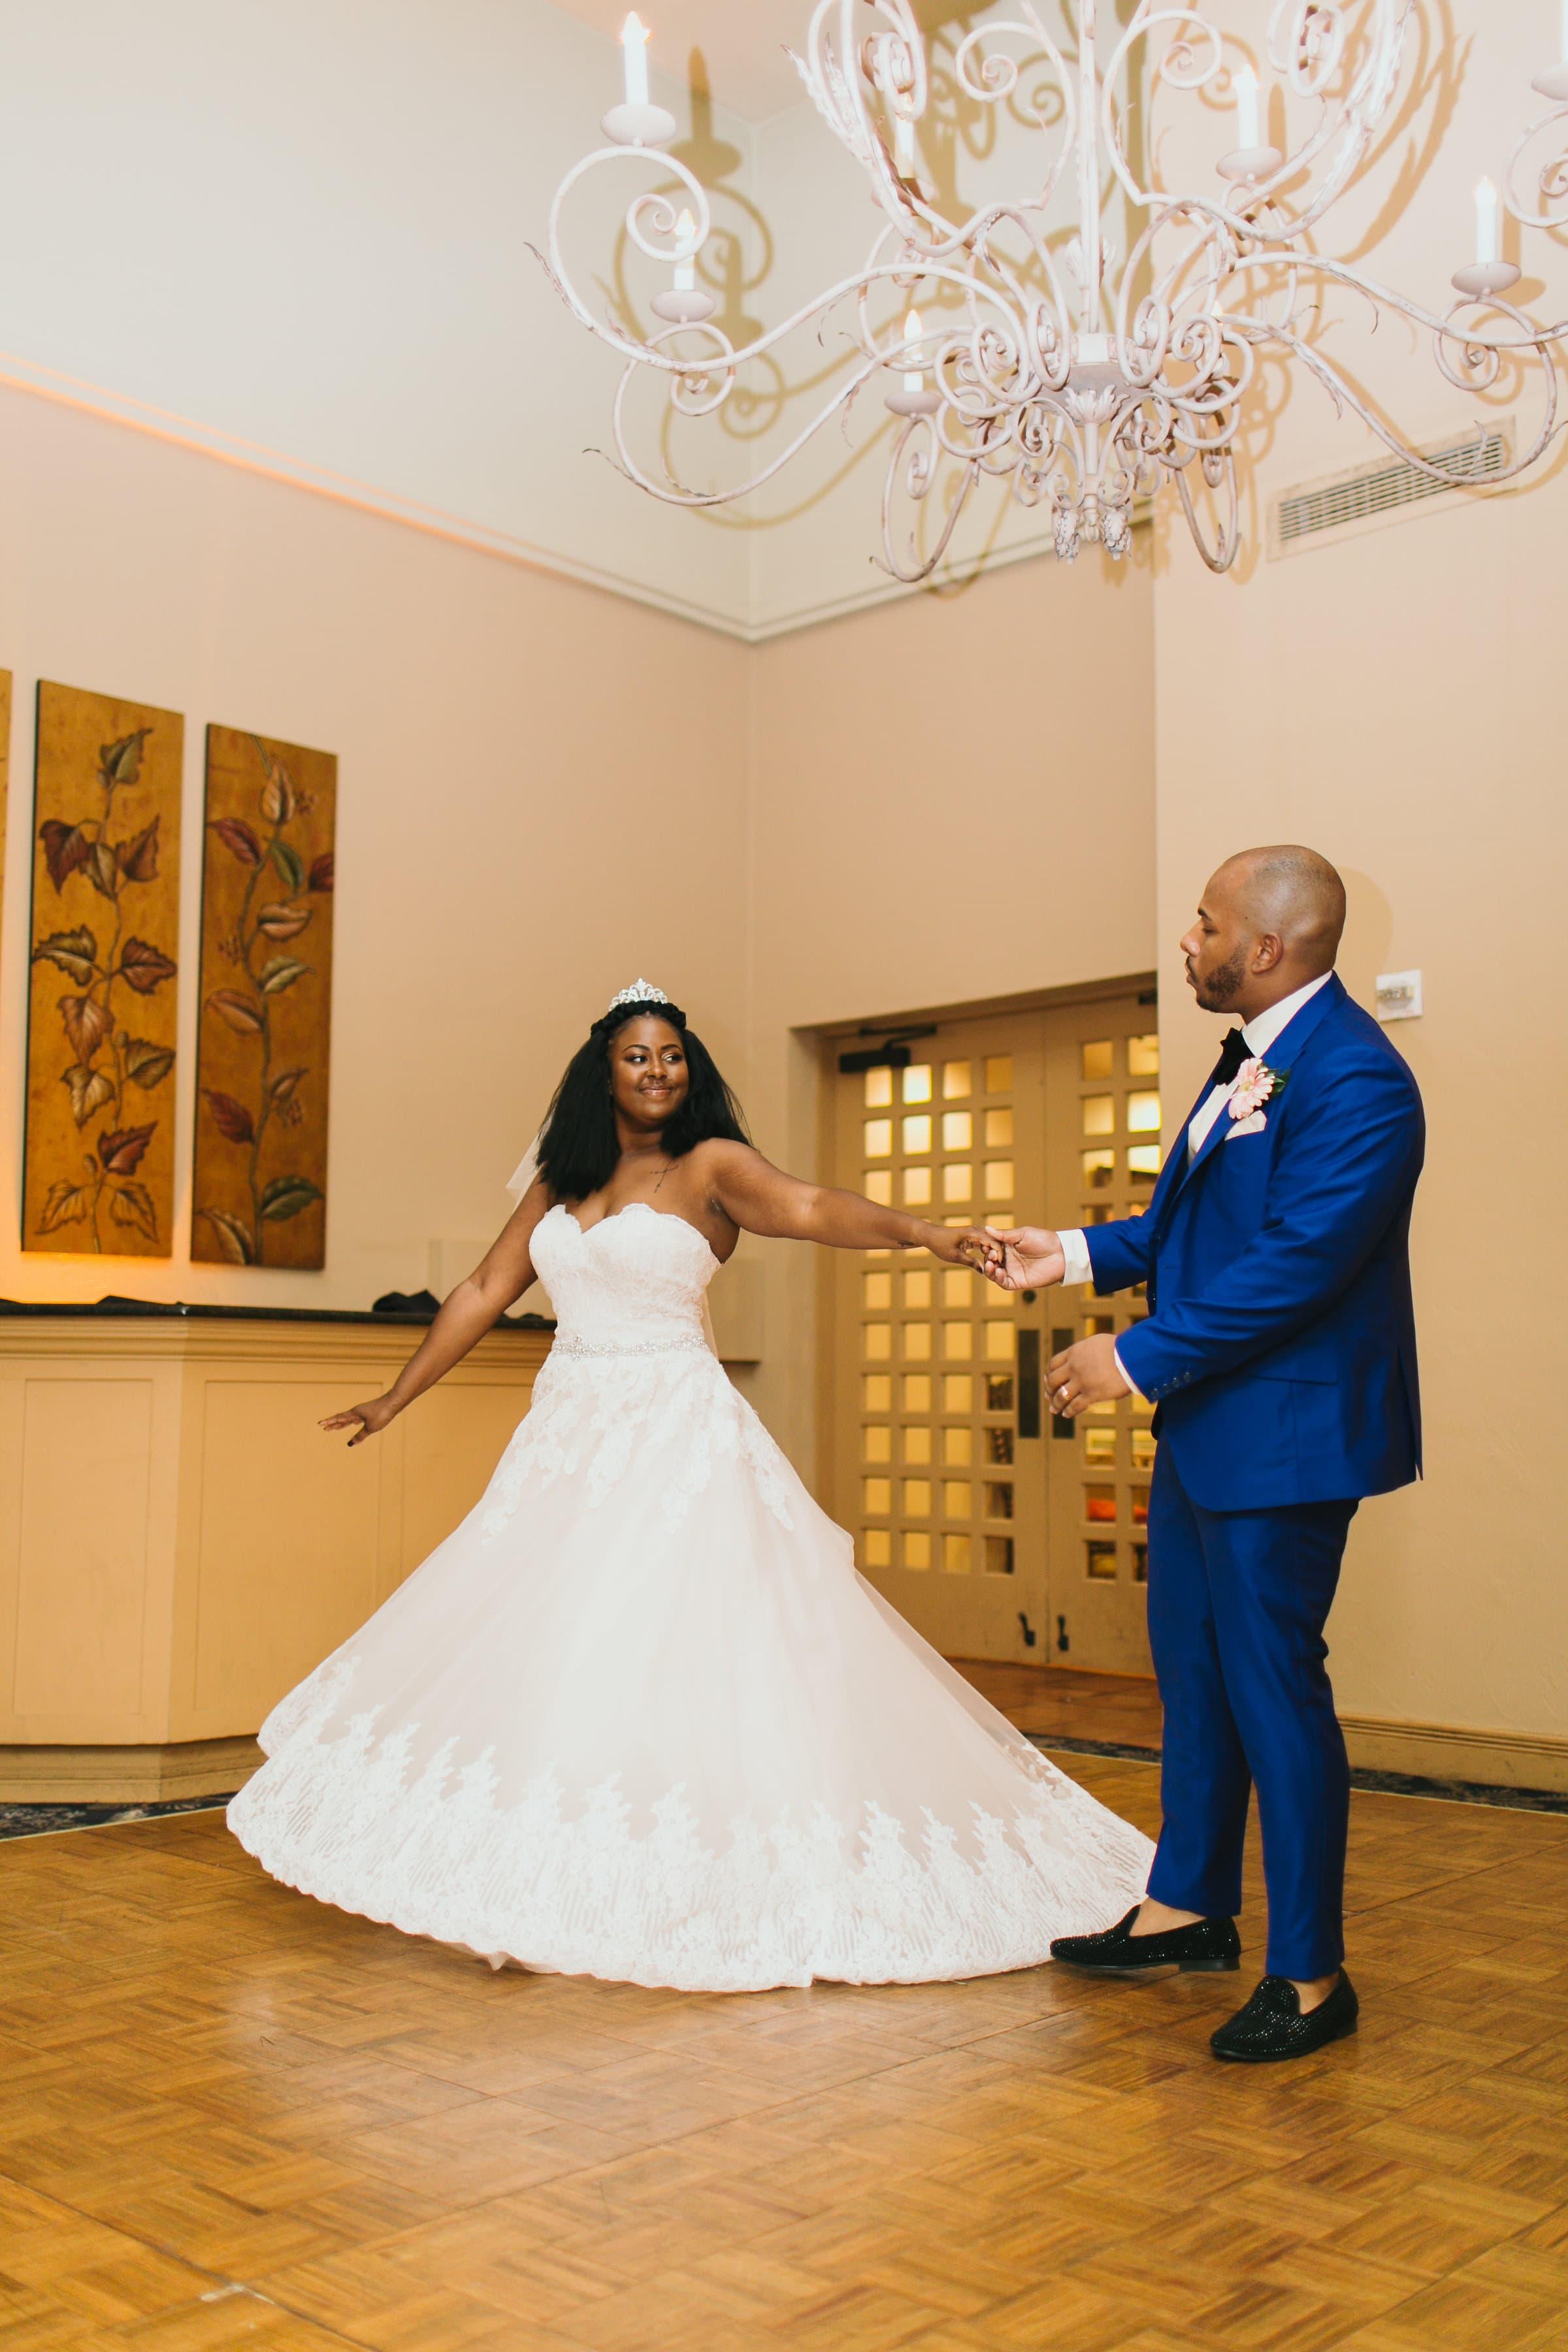 Bride and Groom Swirling on Dancefloor